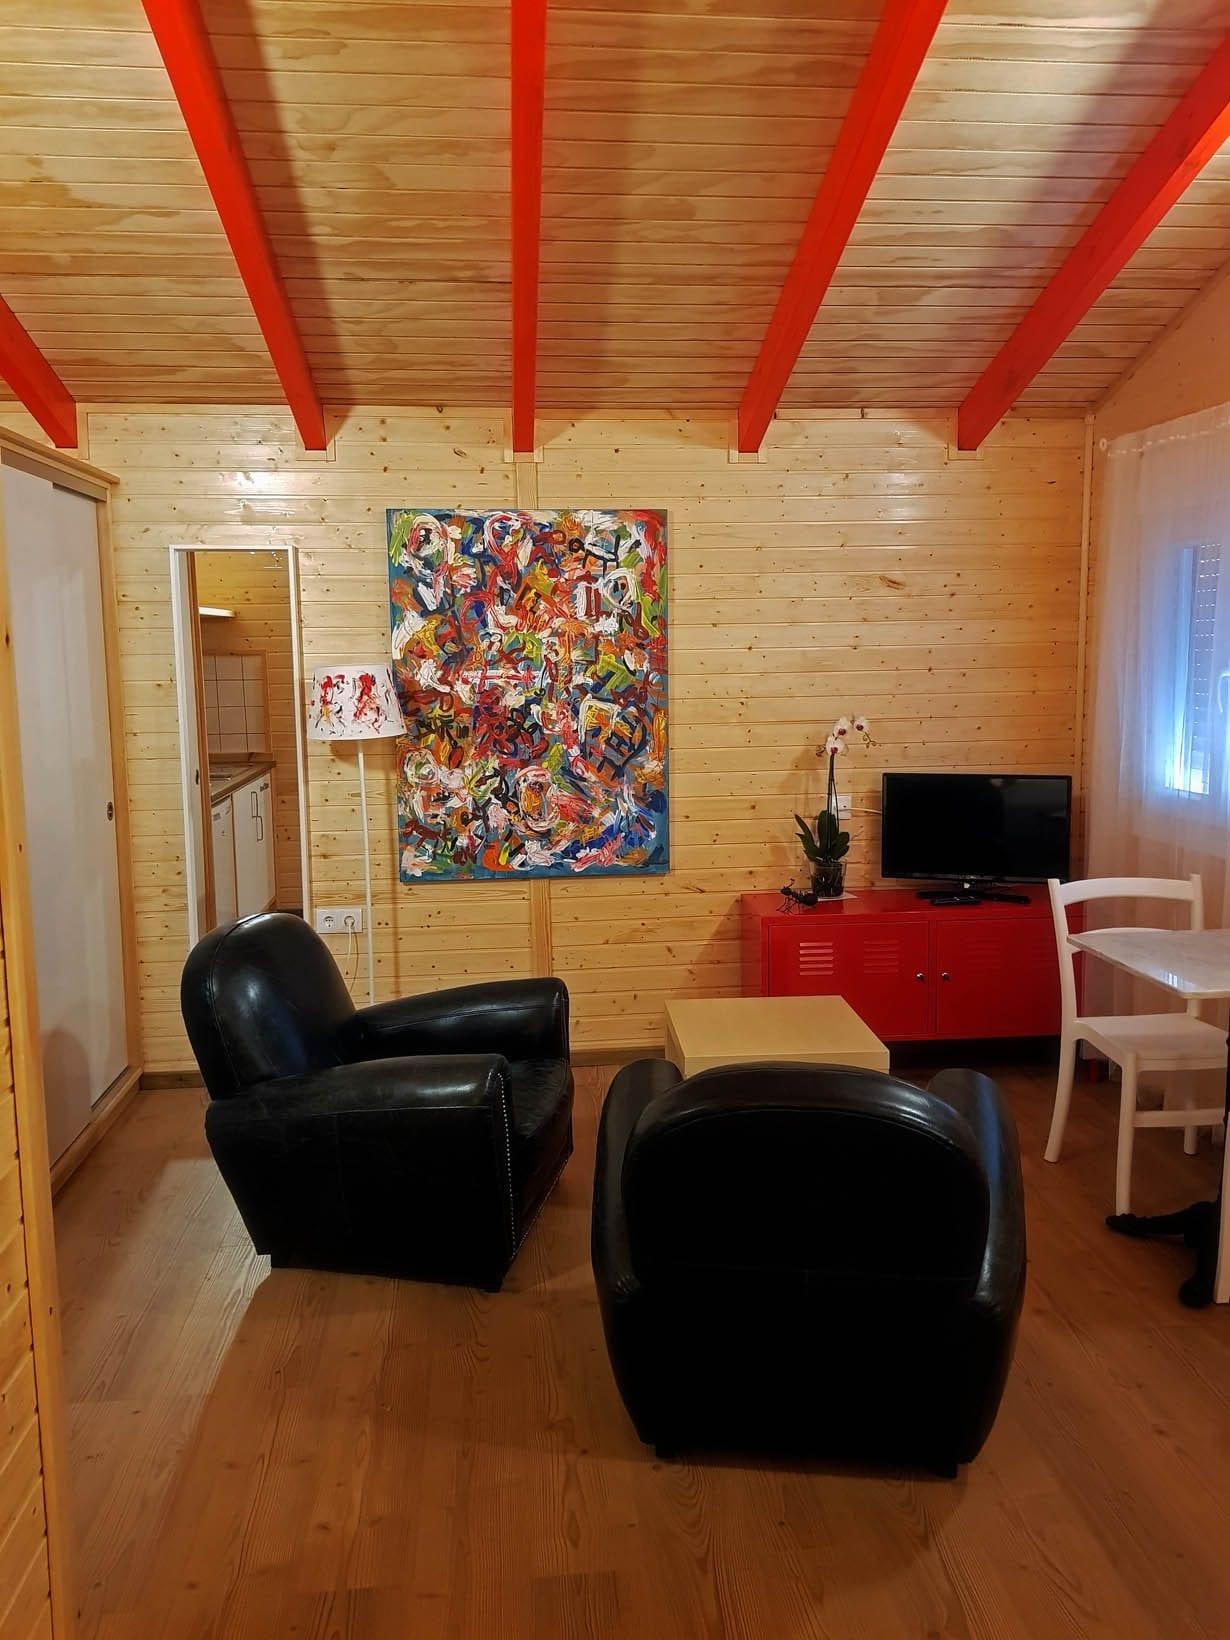 Alojamiento-Casa-del-gato-03